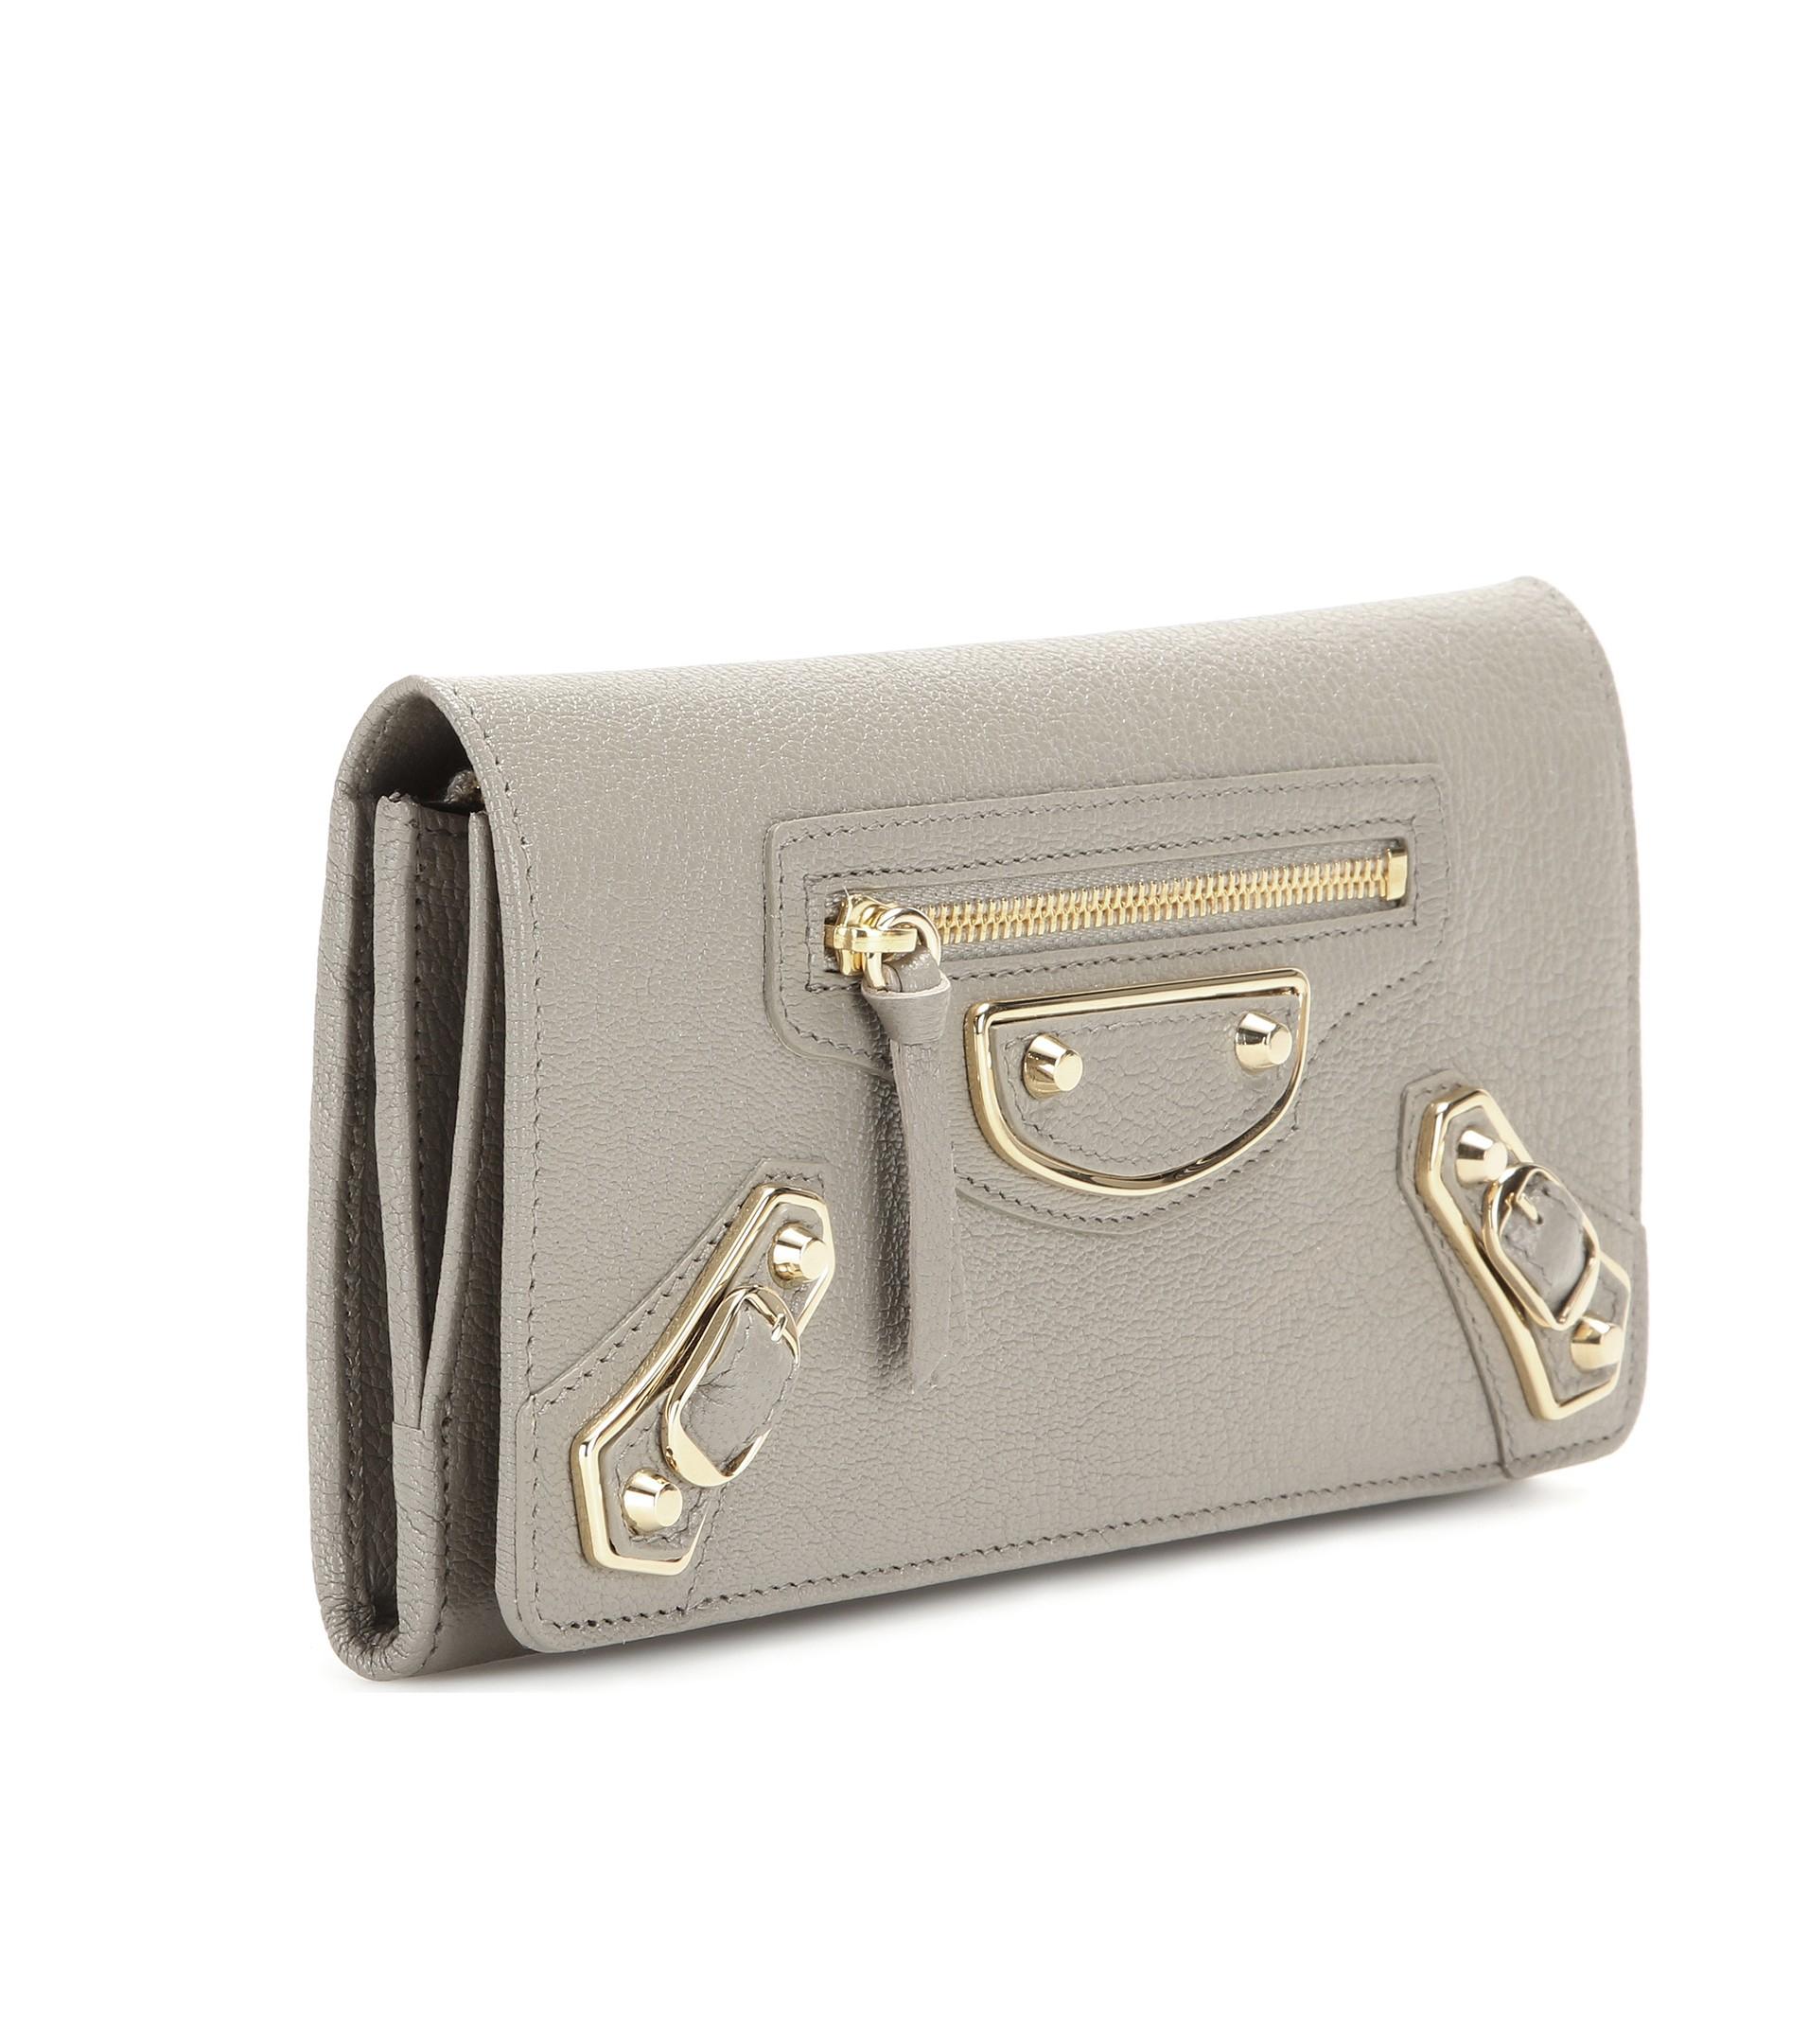 4a9cecc7975 Balenciaga Metallic Edge Money Flap Leather Wallet in Brown - Lyst